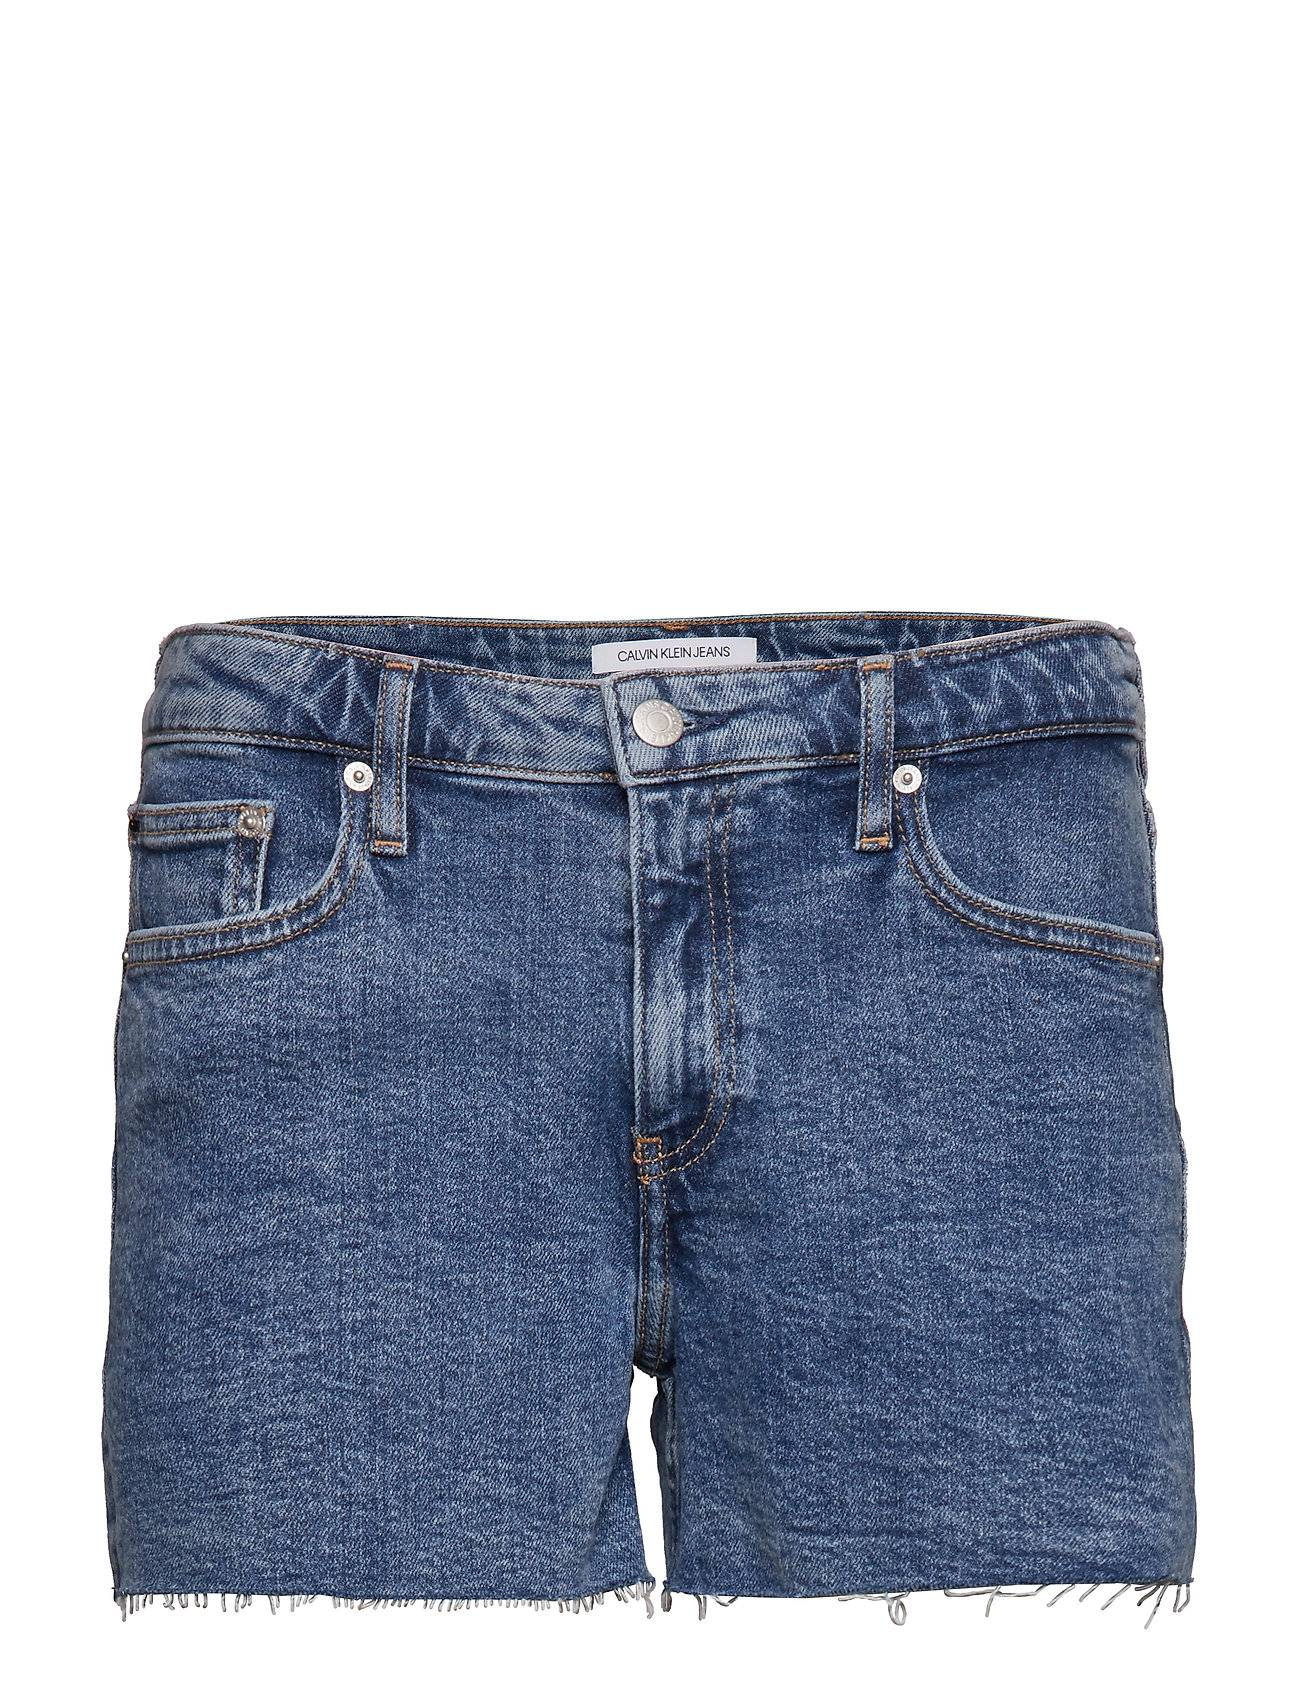 Image of Calvin Mid Rise Weekend Sho Shorts Denim Shorts Sininen Calvin Klein Jeans